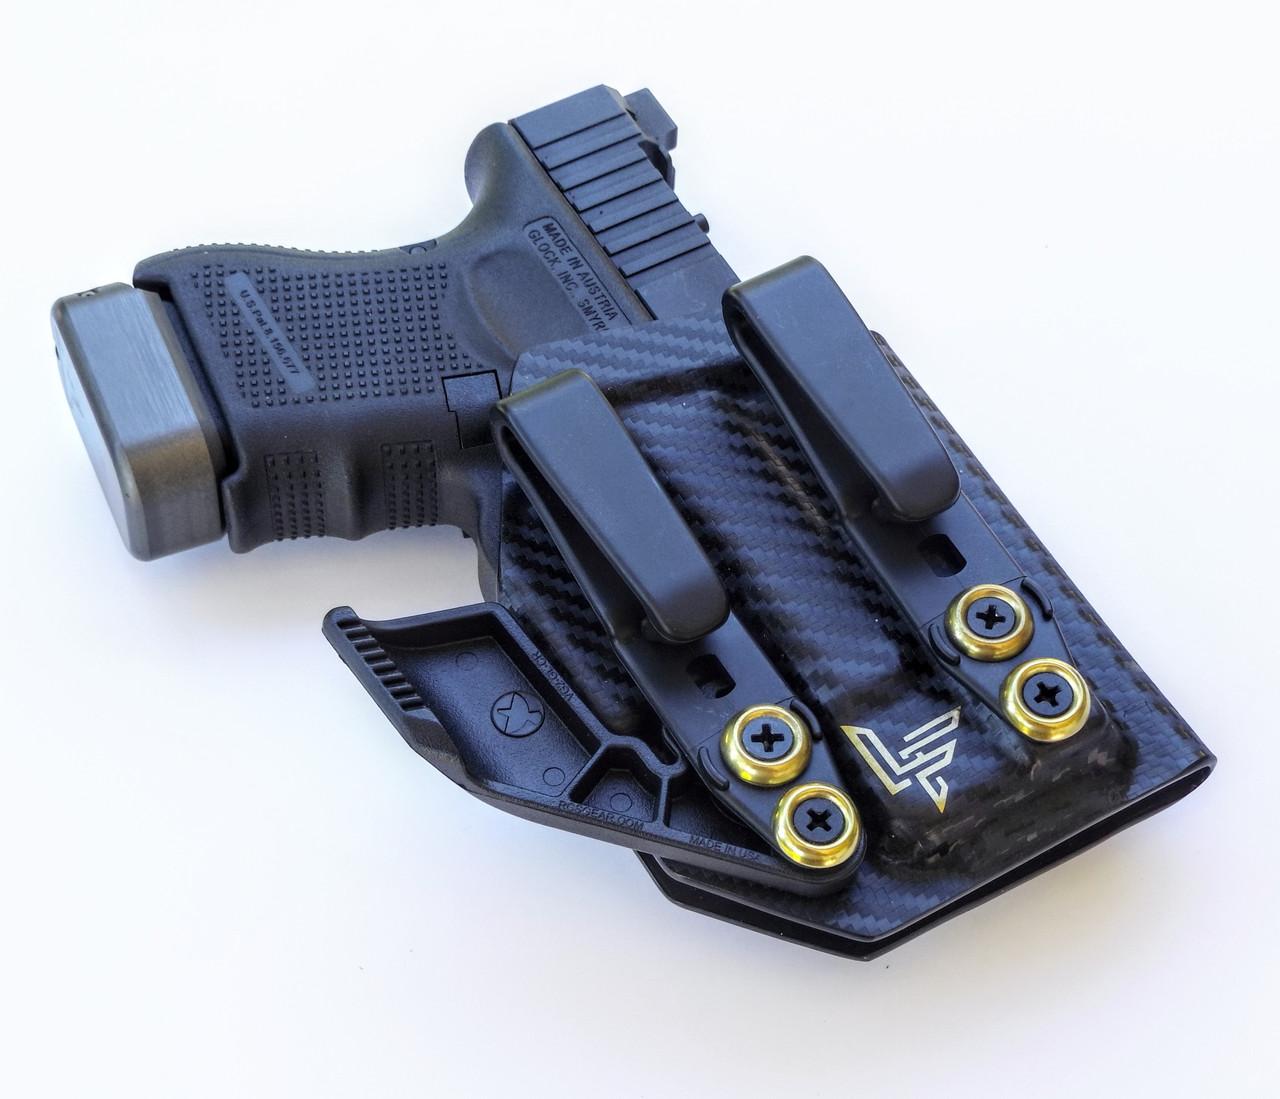 Glock 26 Carbon Fiber Holster